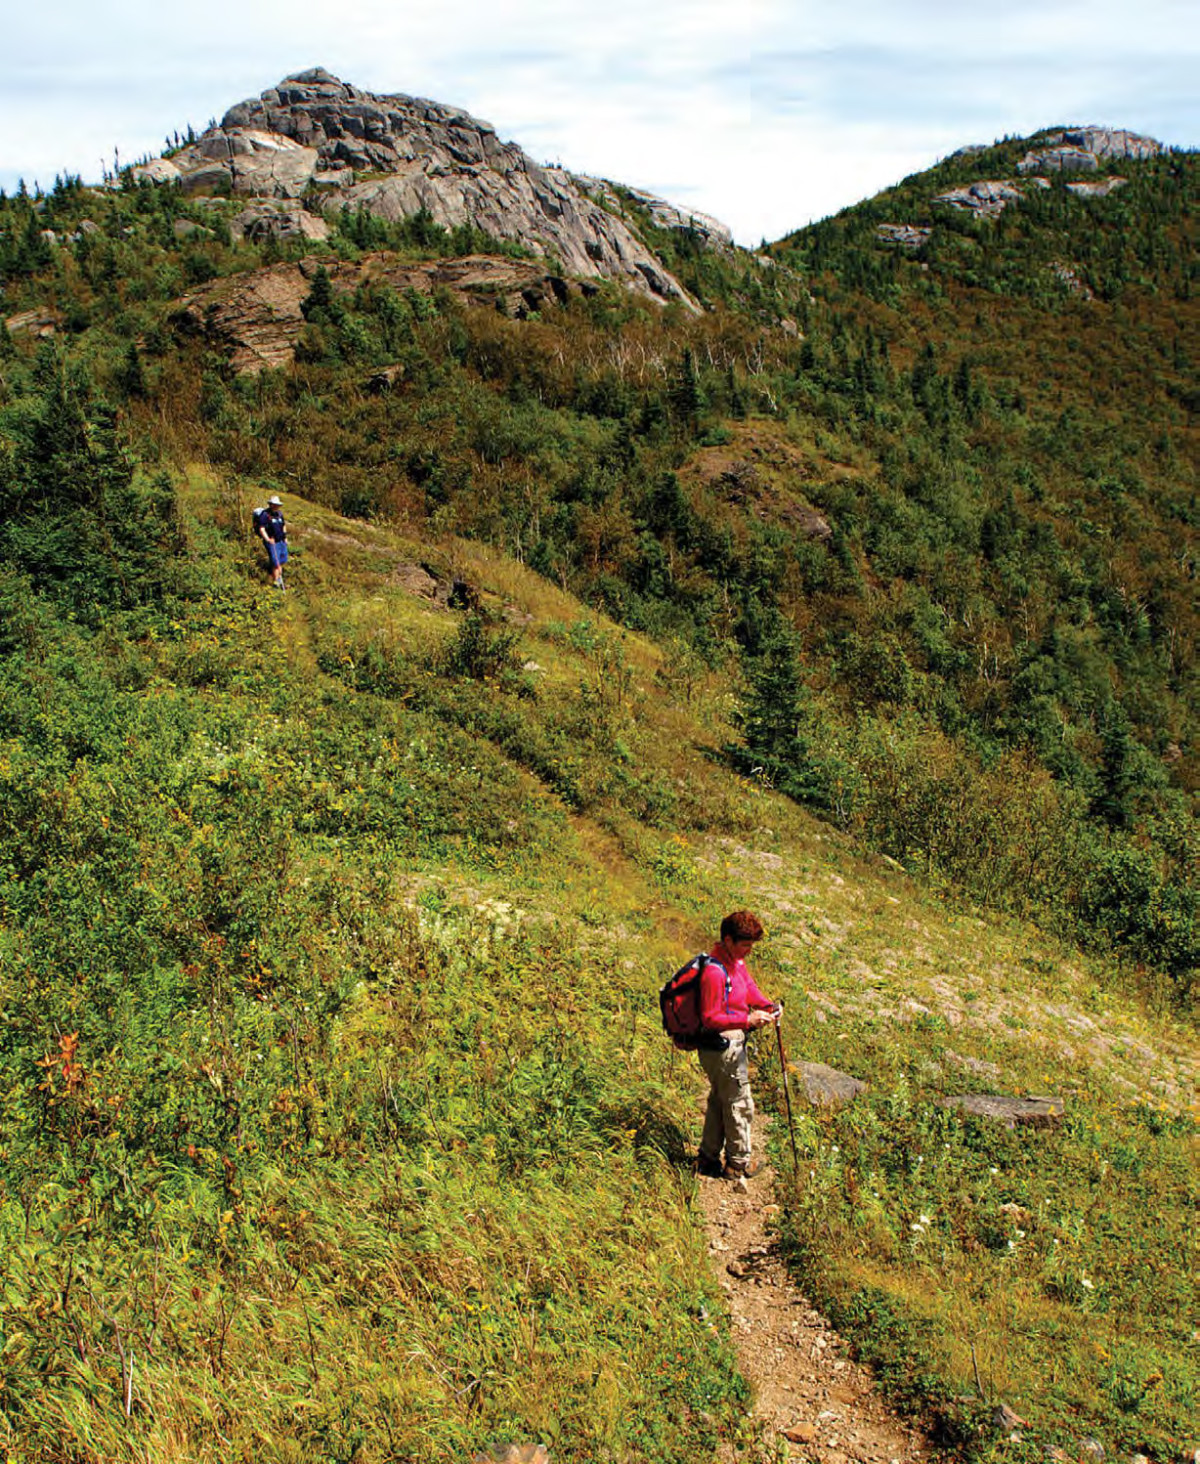 A hiker stands below a rocky summit on an open trail